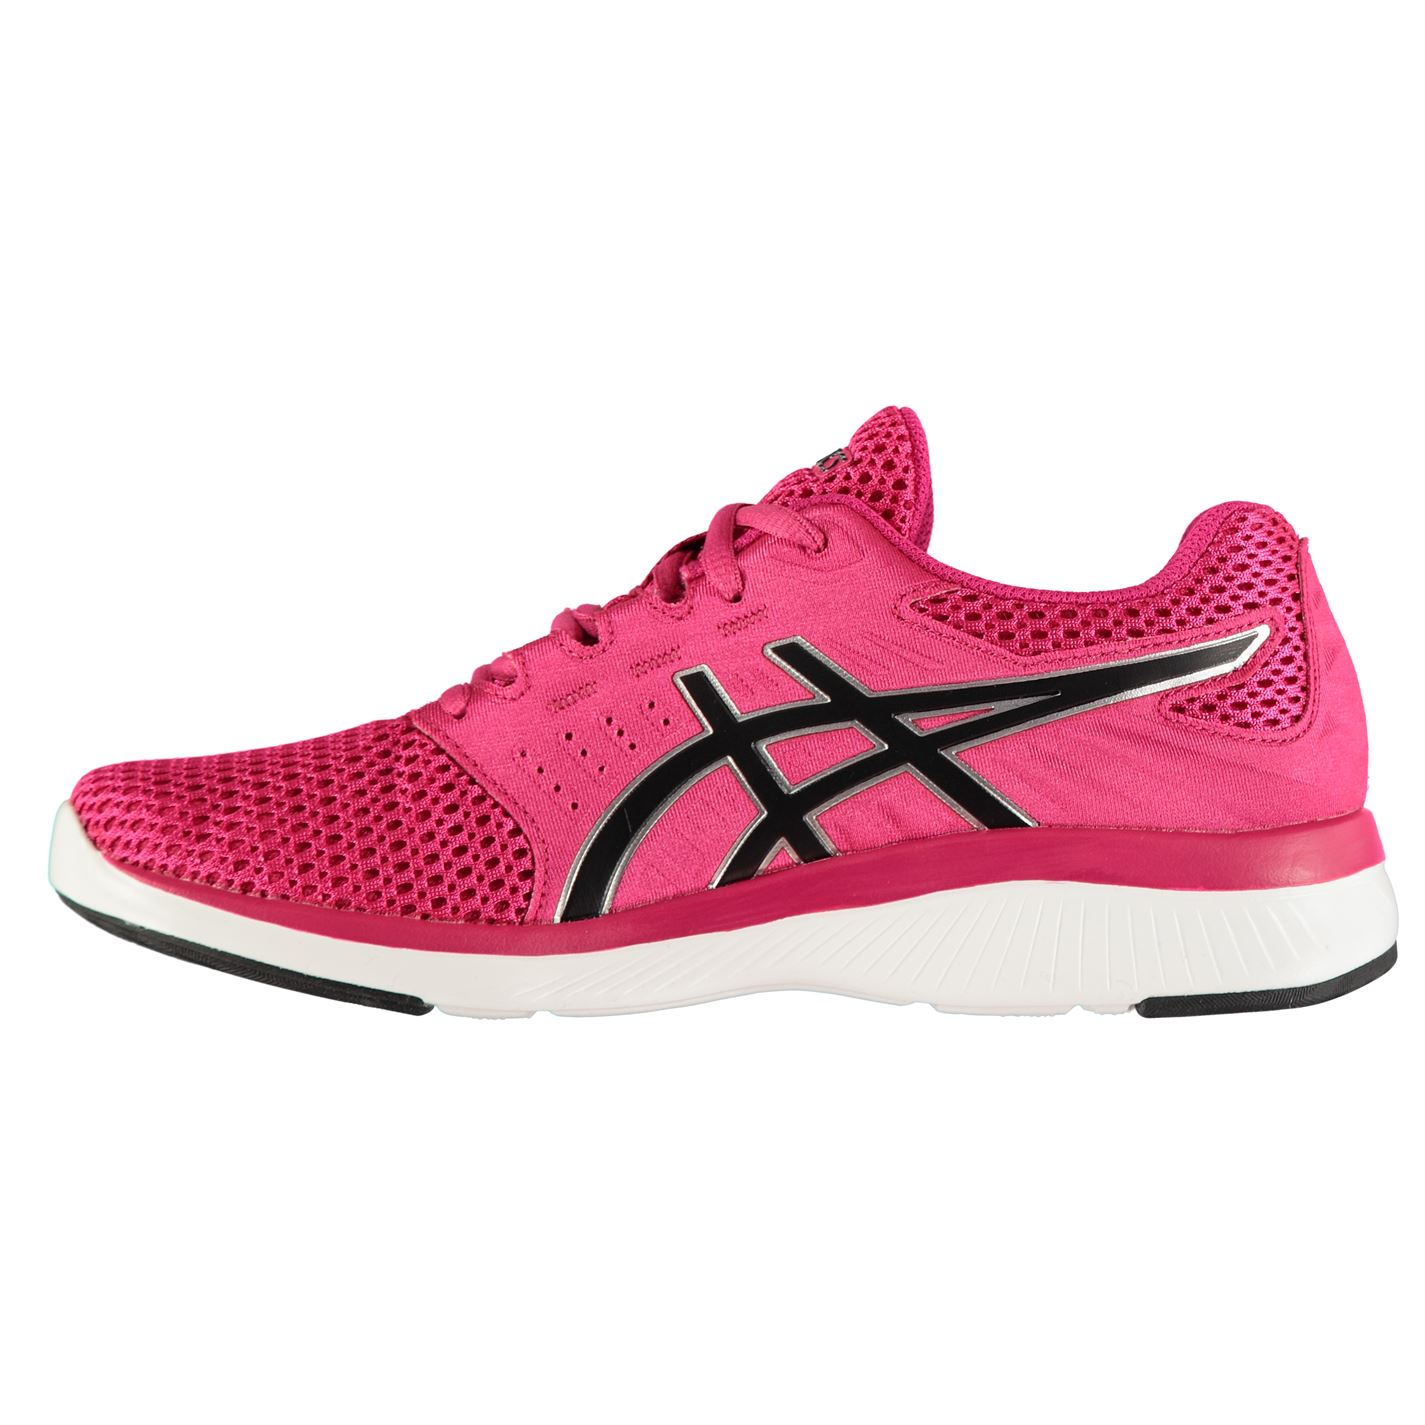 Asics Womens Gel Gel Gel Moya Running shoes Road Lace Up Breathable Lightweight Mesh 216750